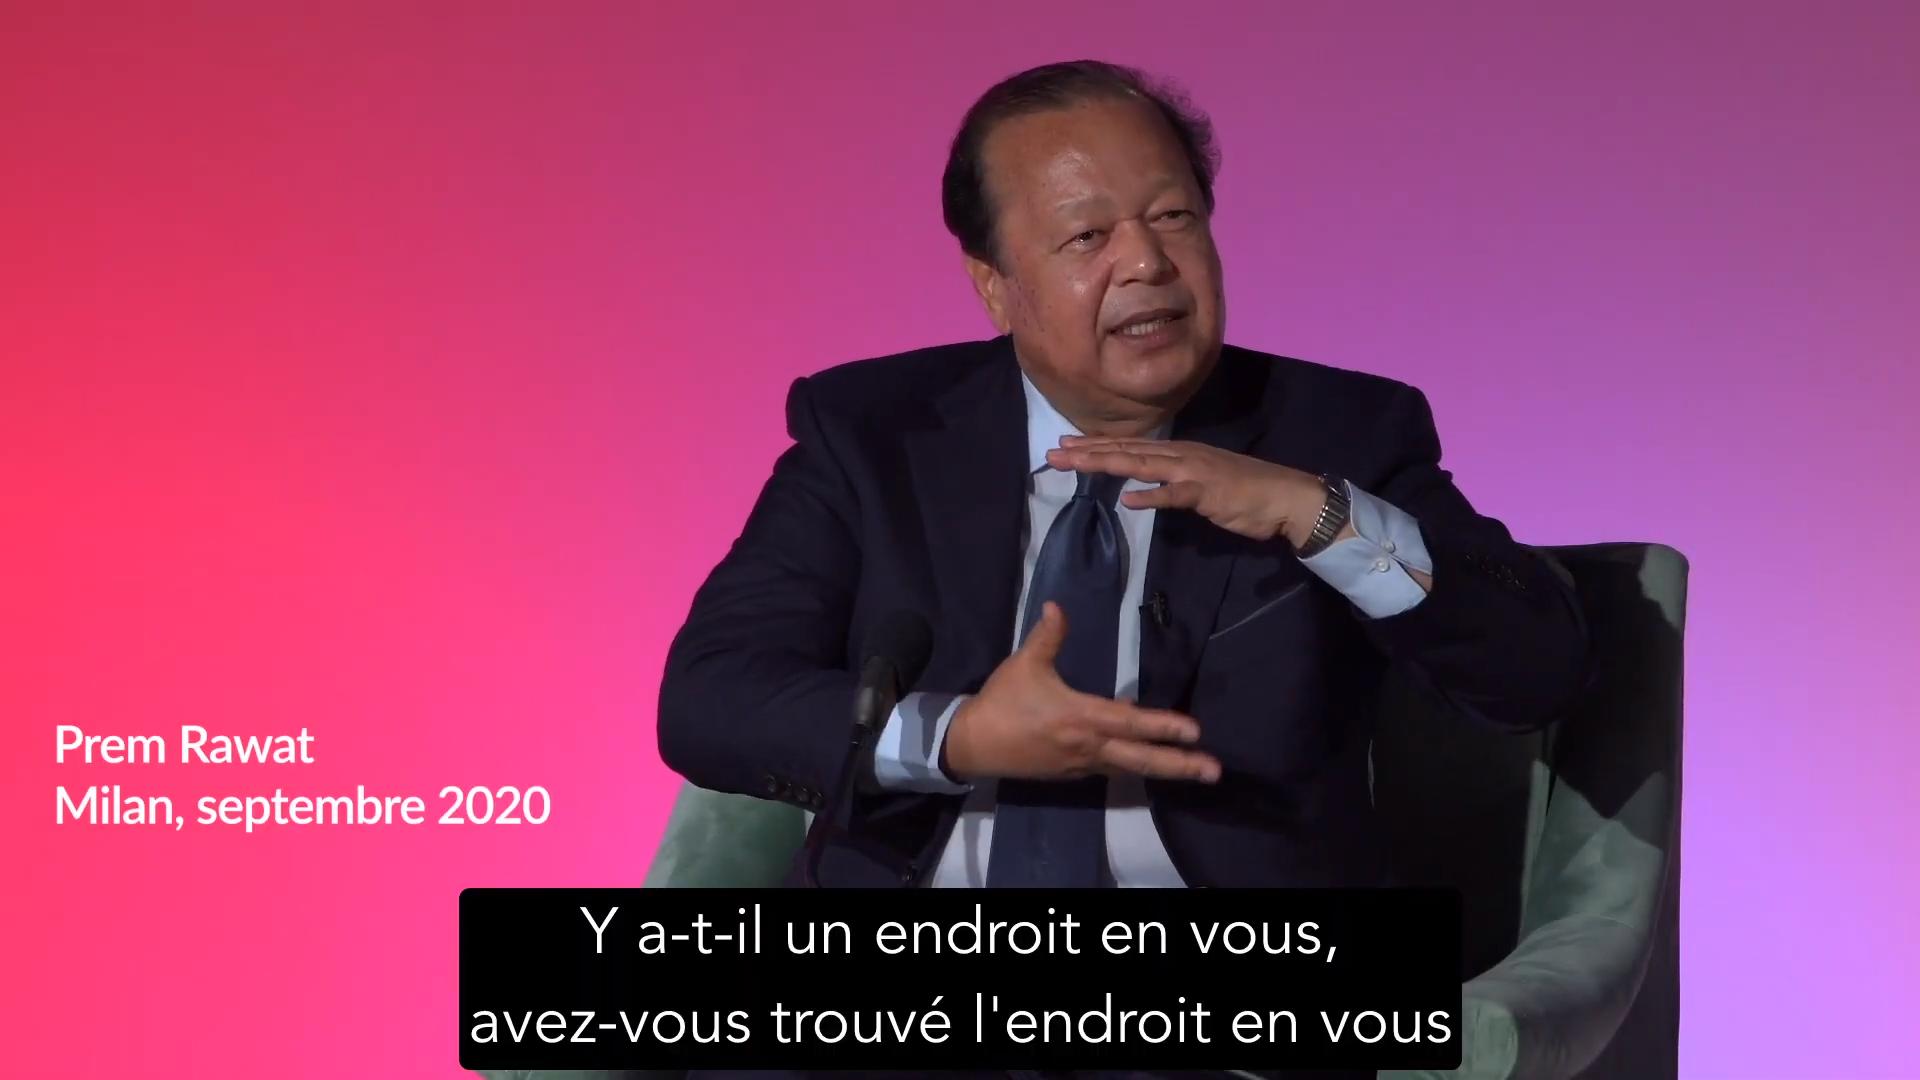 milan-septembre-2020-presentation-livre-apprendre-a-s-ecouter